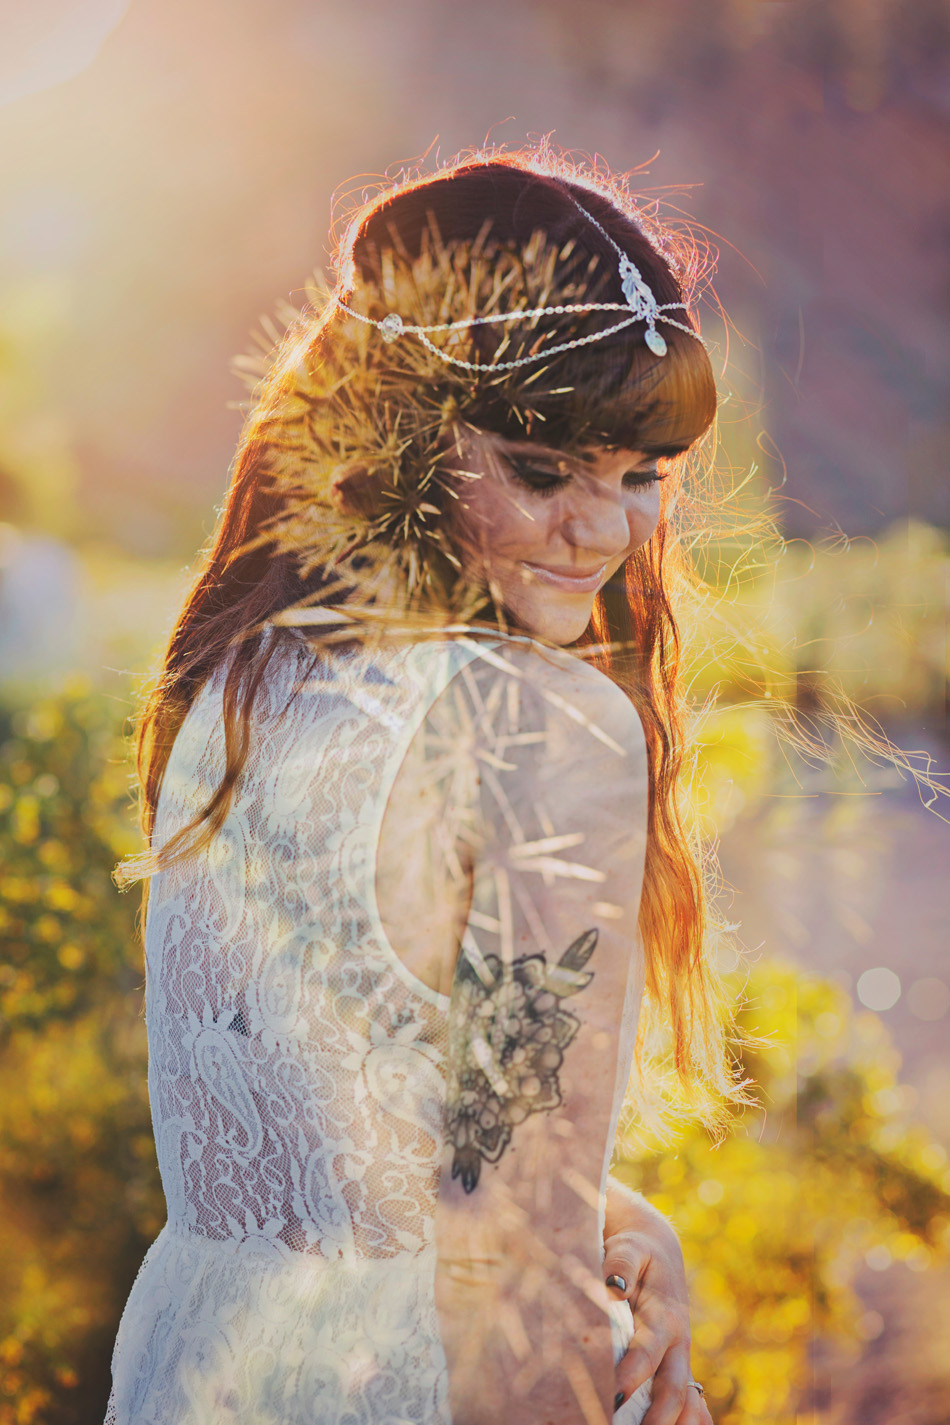 photographe-mariage-las-vegas-floriane-caux-poppylarue (39)